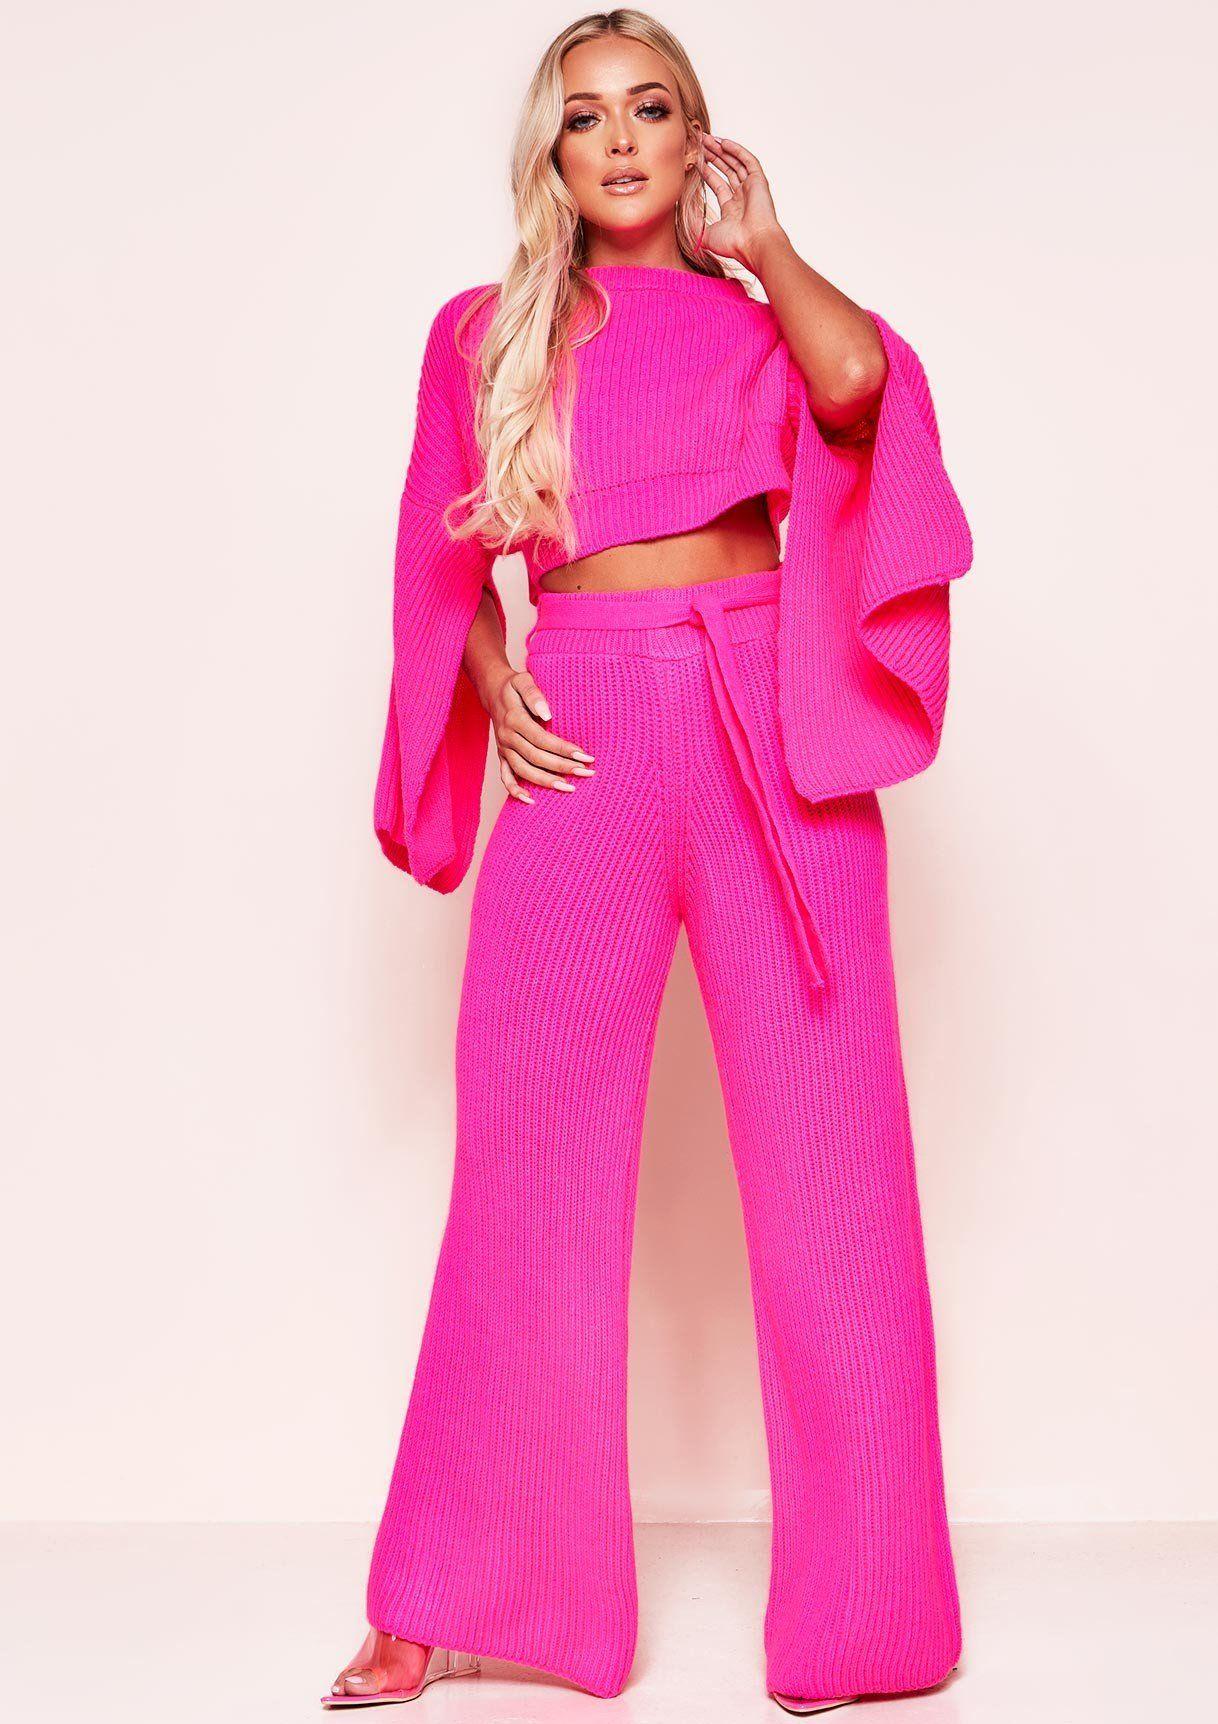 cbc4fc9c679e Missyempire - Francie Neon Pink Knit Ribbed Split Sleeve Co-ord Set